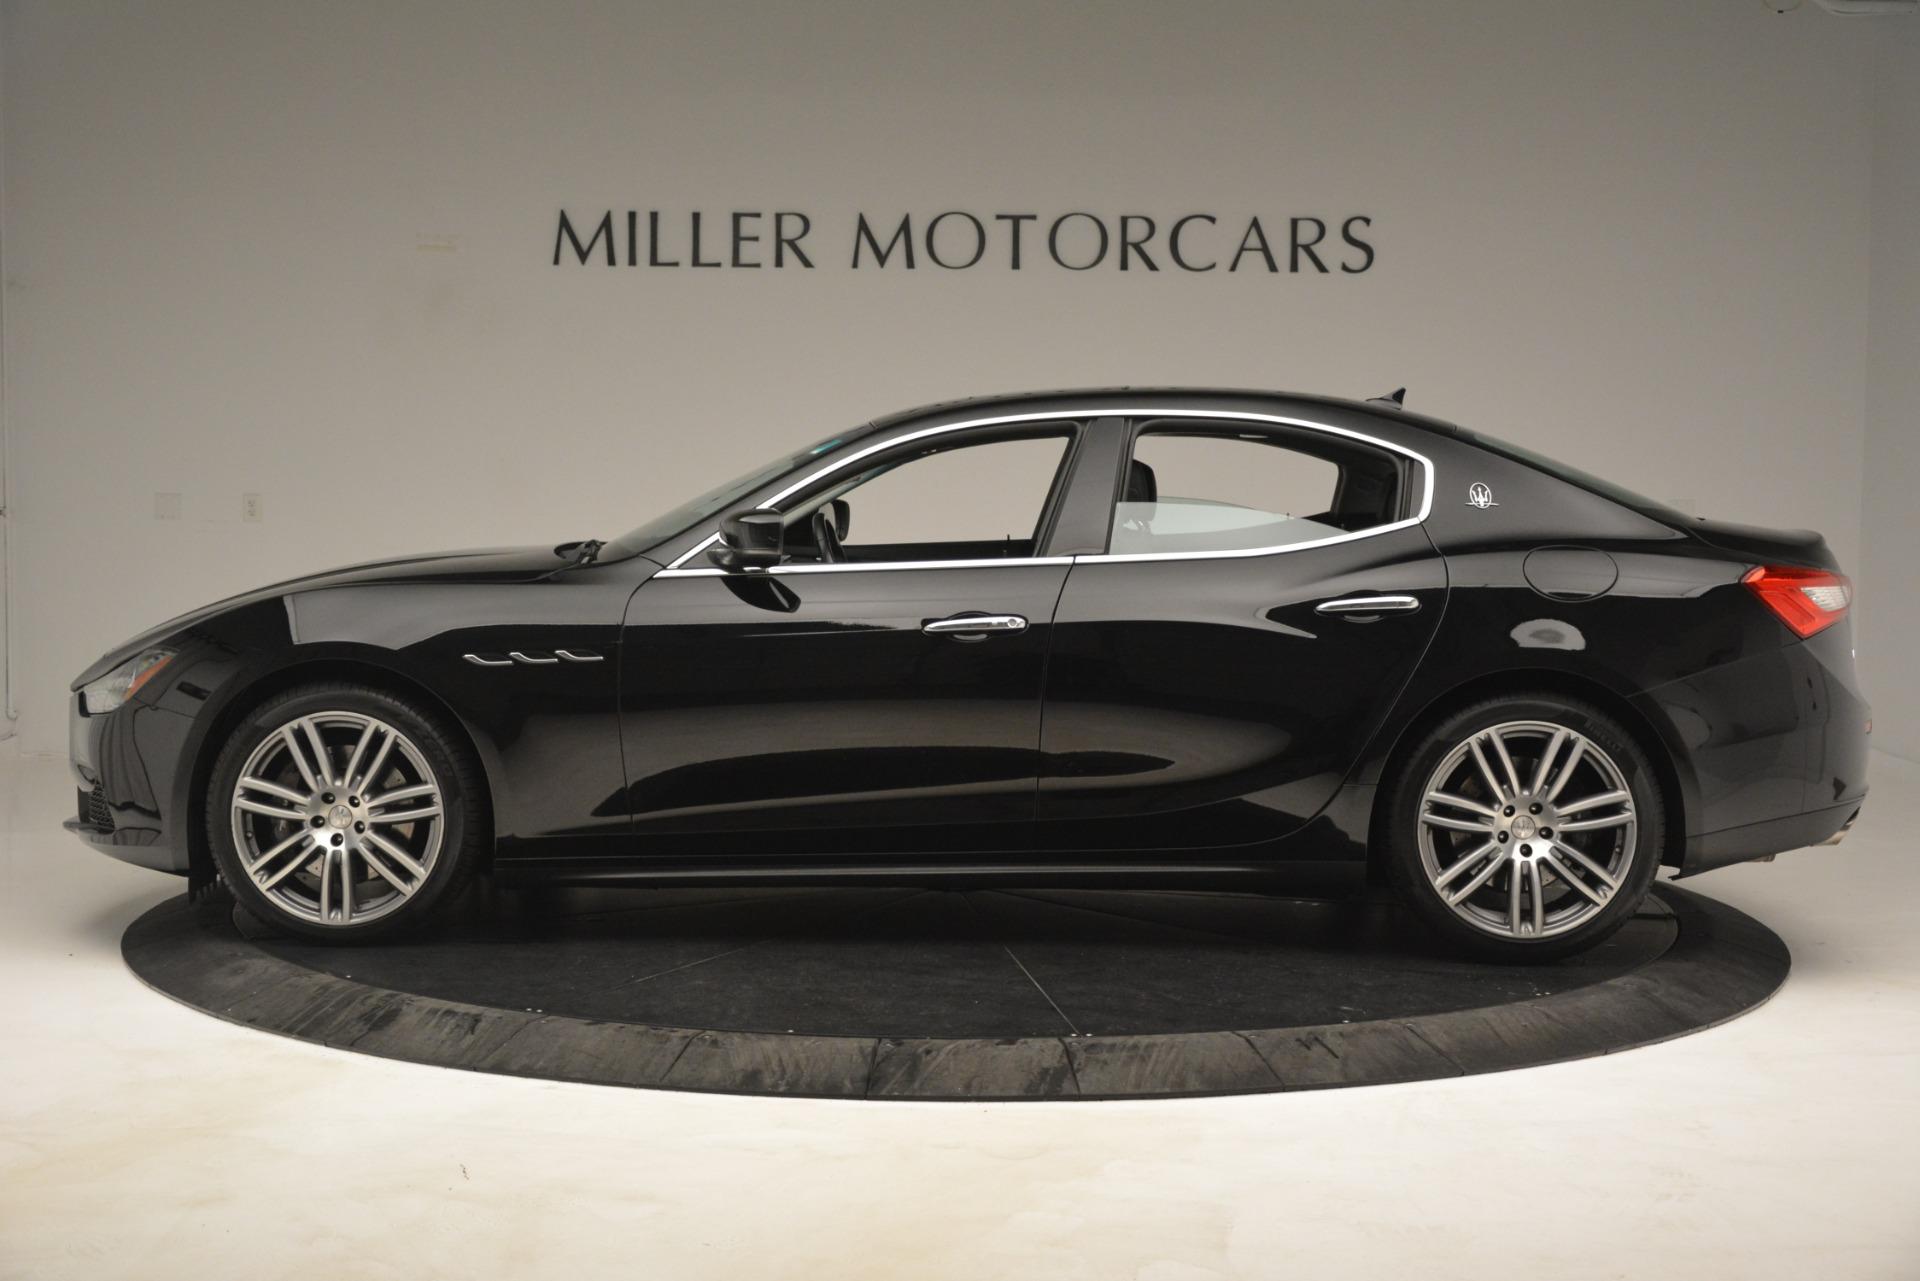 Used 2015 Maserati Ghibli S Q4 For Sale In Greenwich, CT 3102_p3